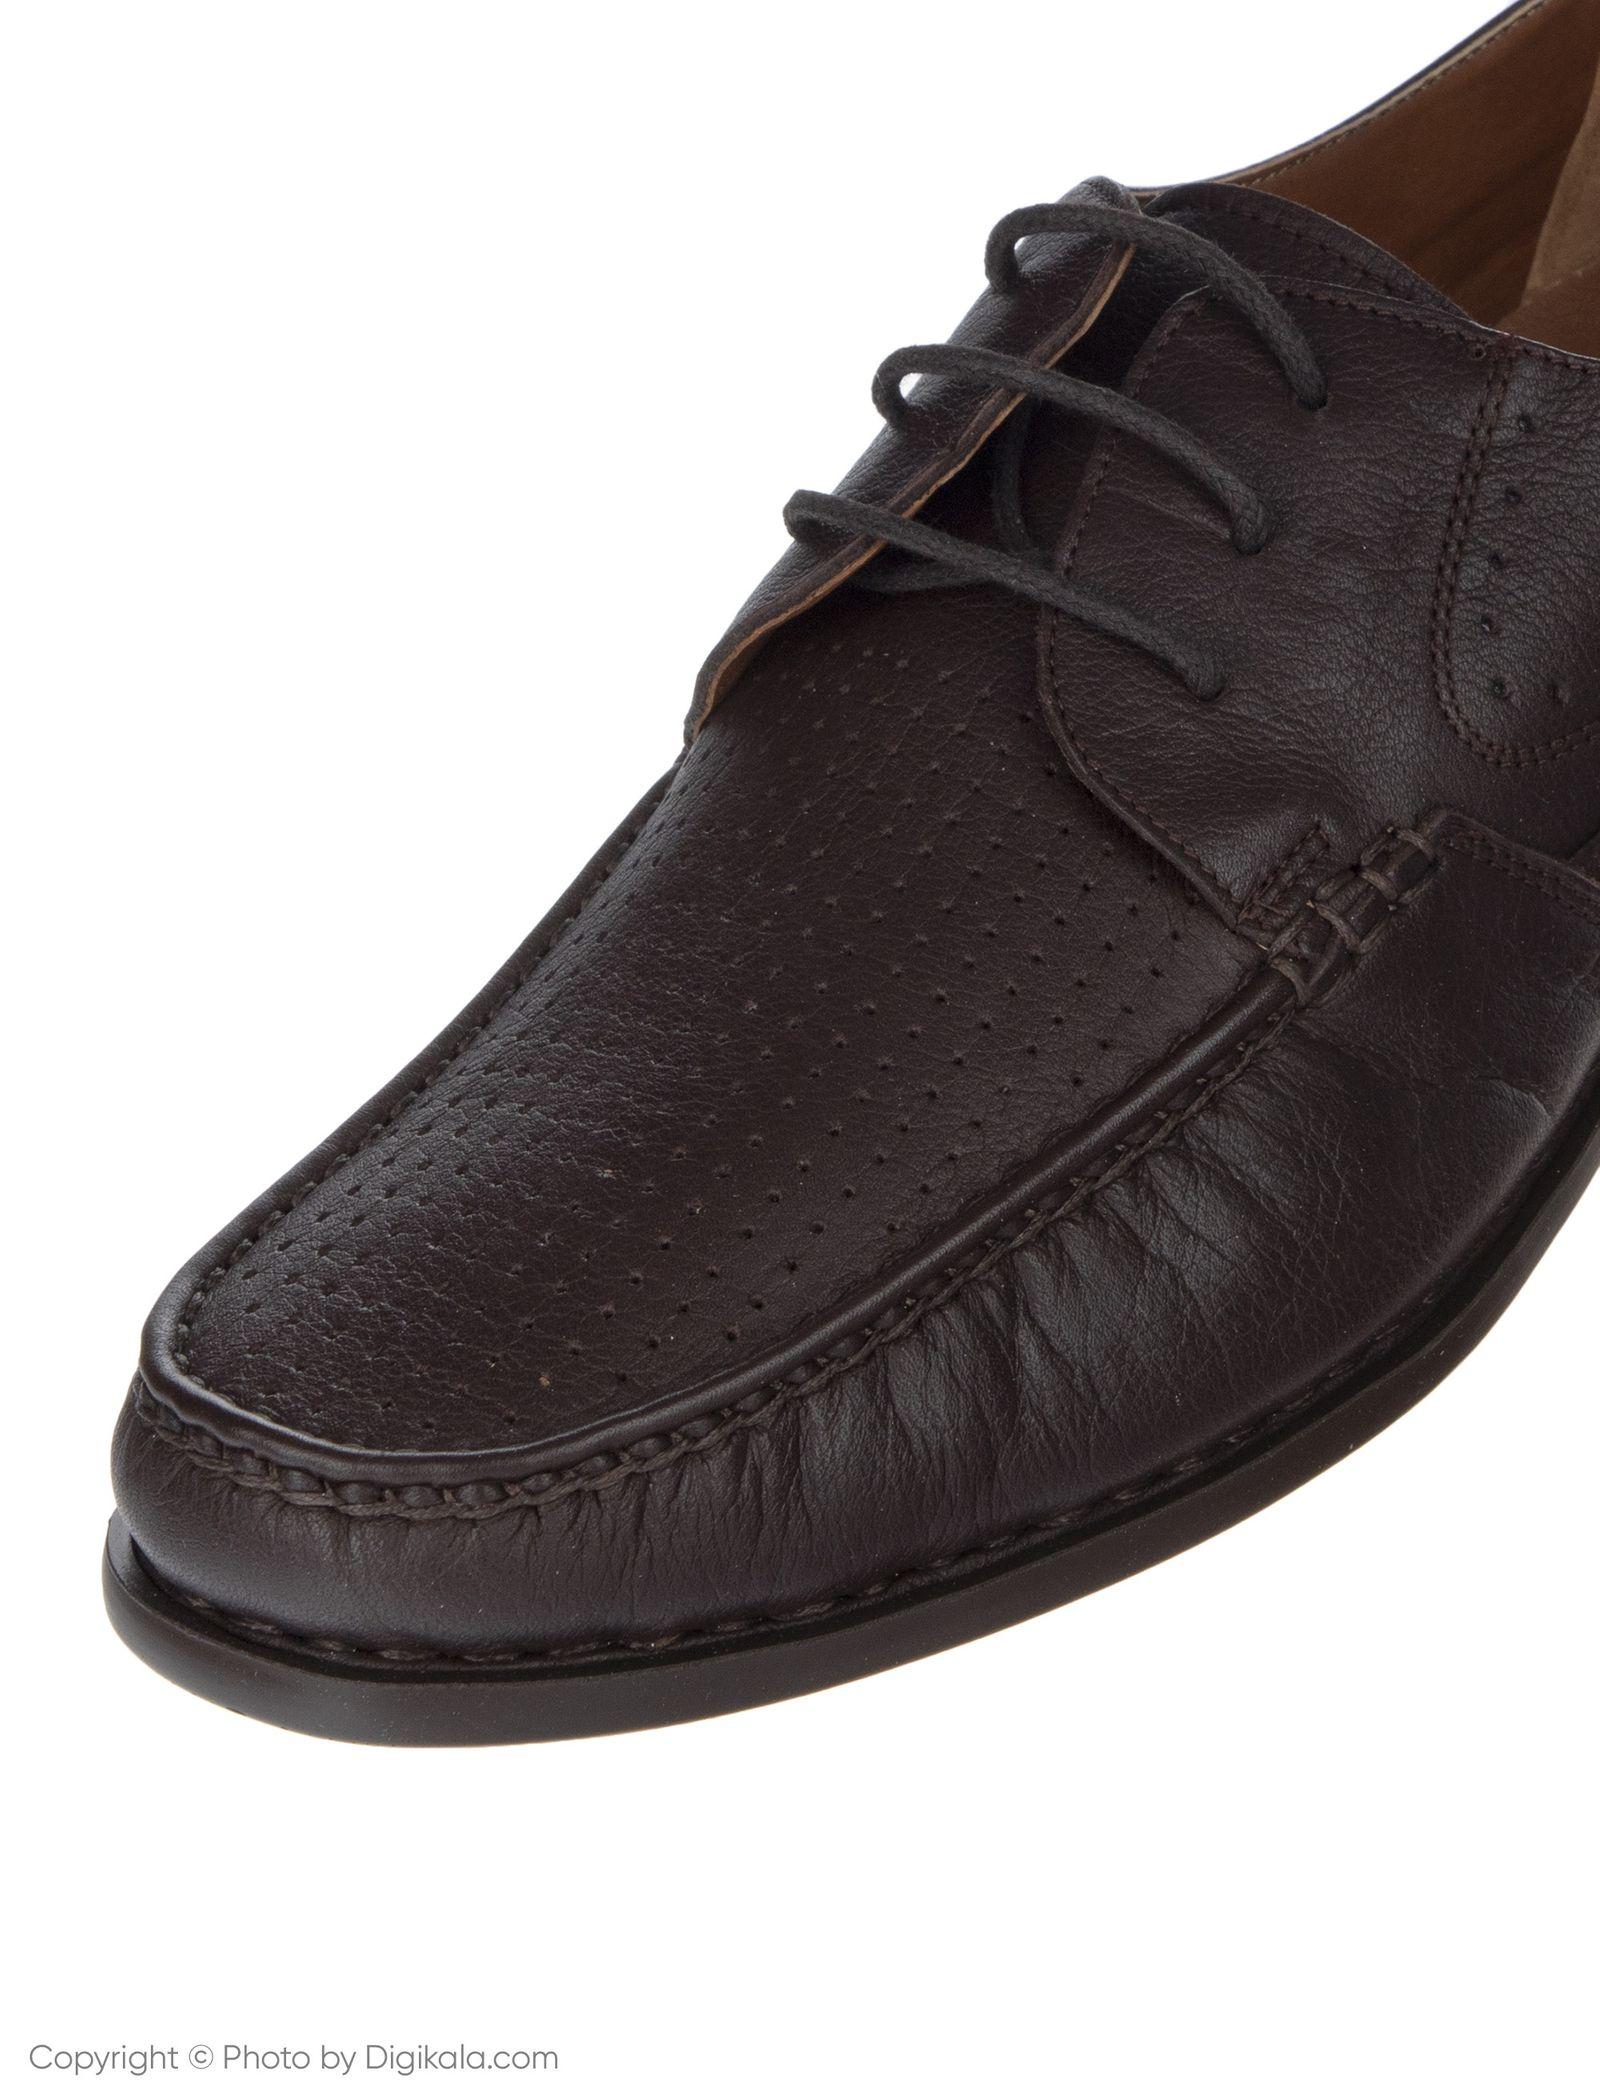 کفش روزمره مردانه پولاریس مدل 100296904-103 - قهوه ای - 8